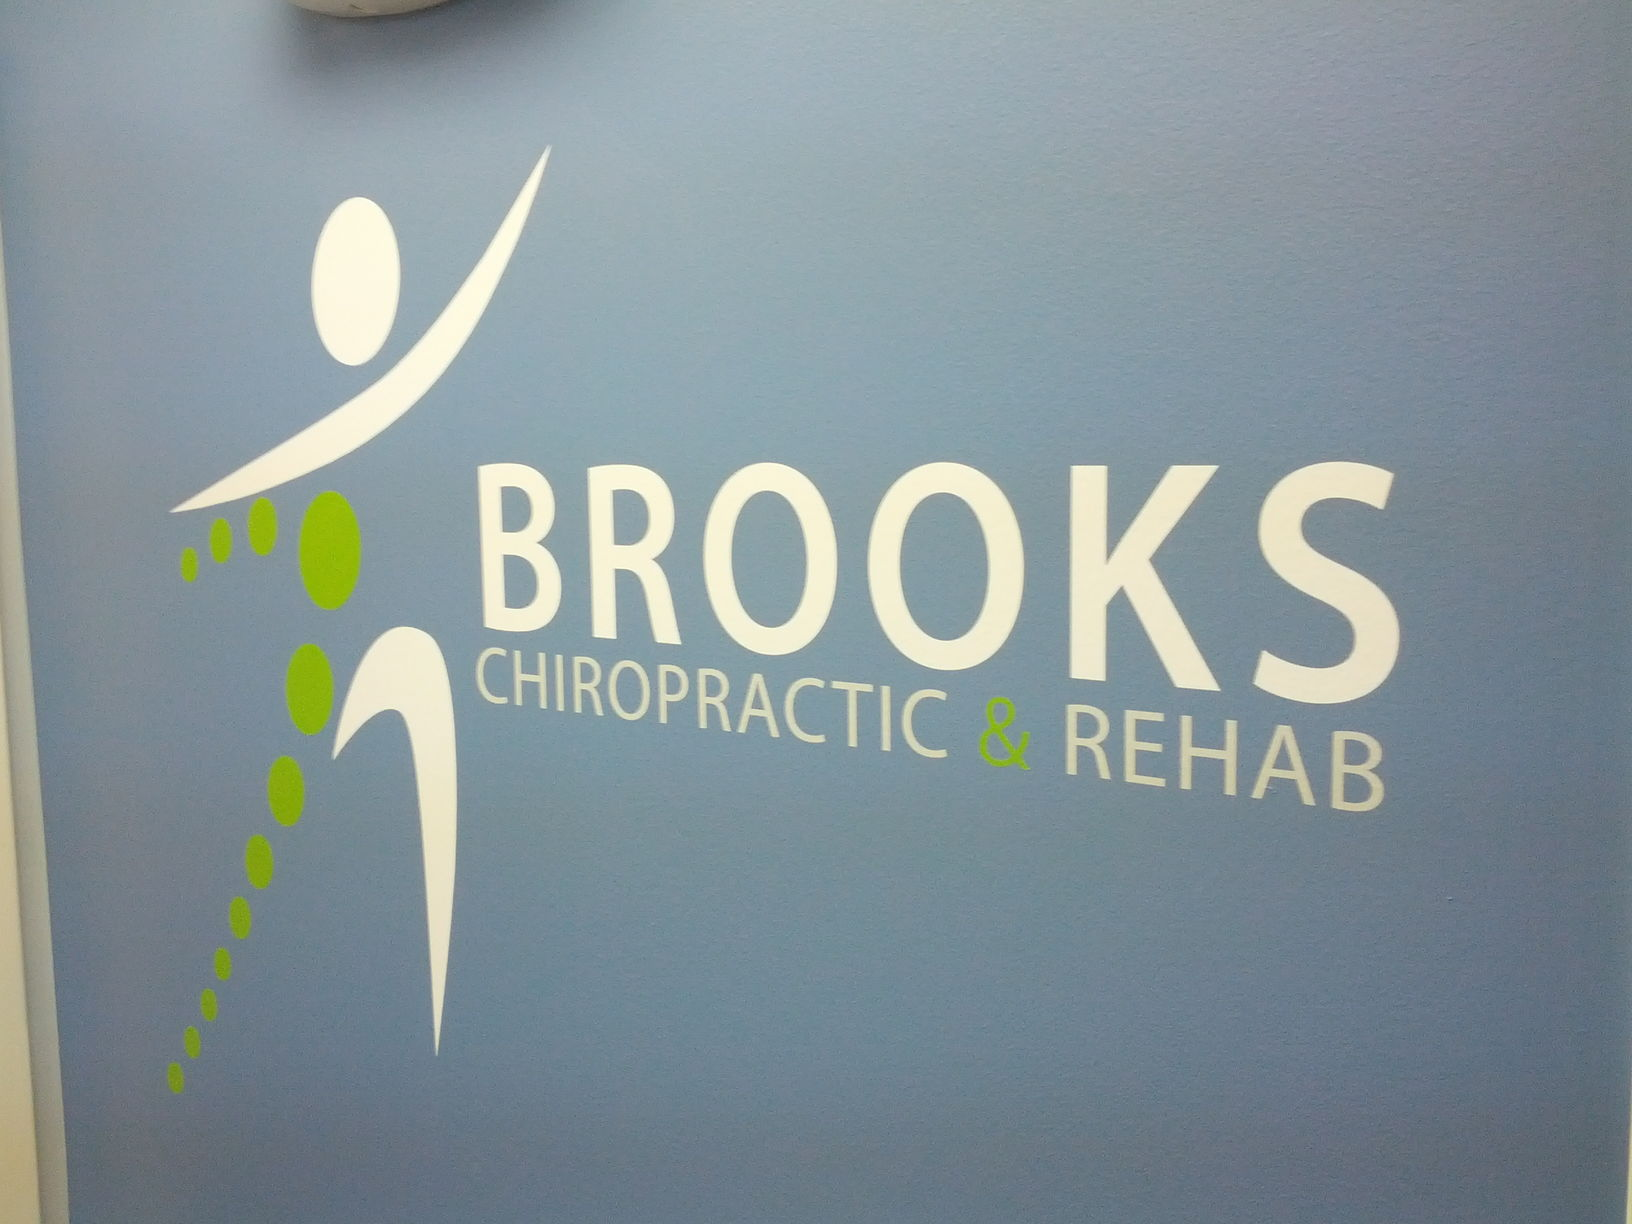 Brooks Chiropractic & Rehab